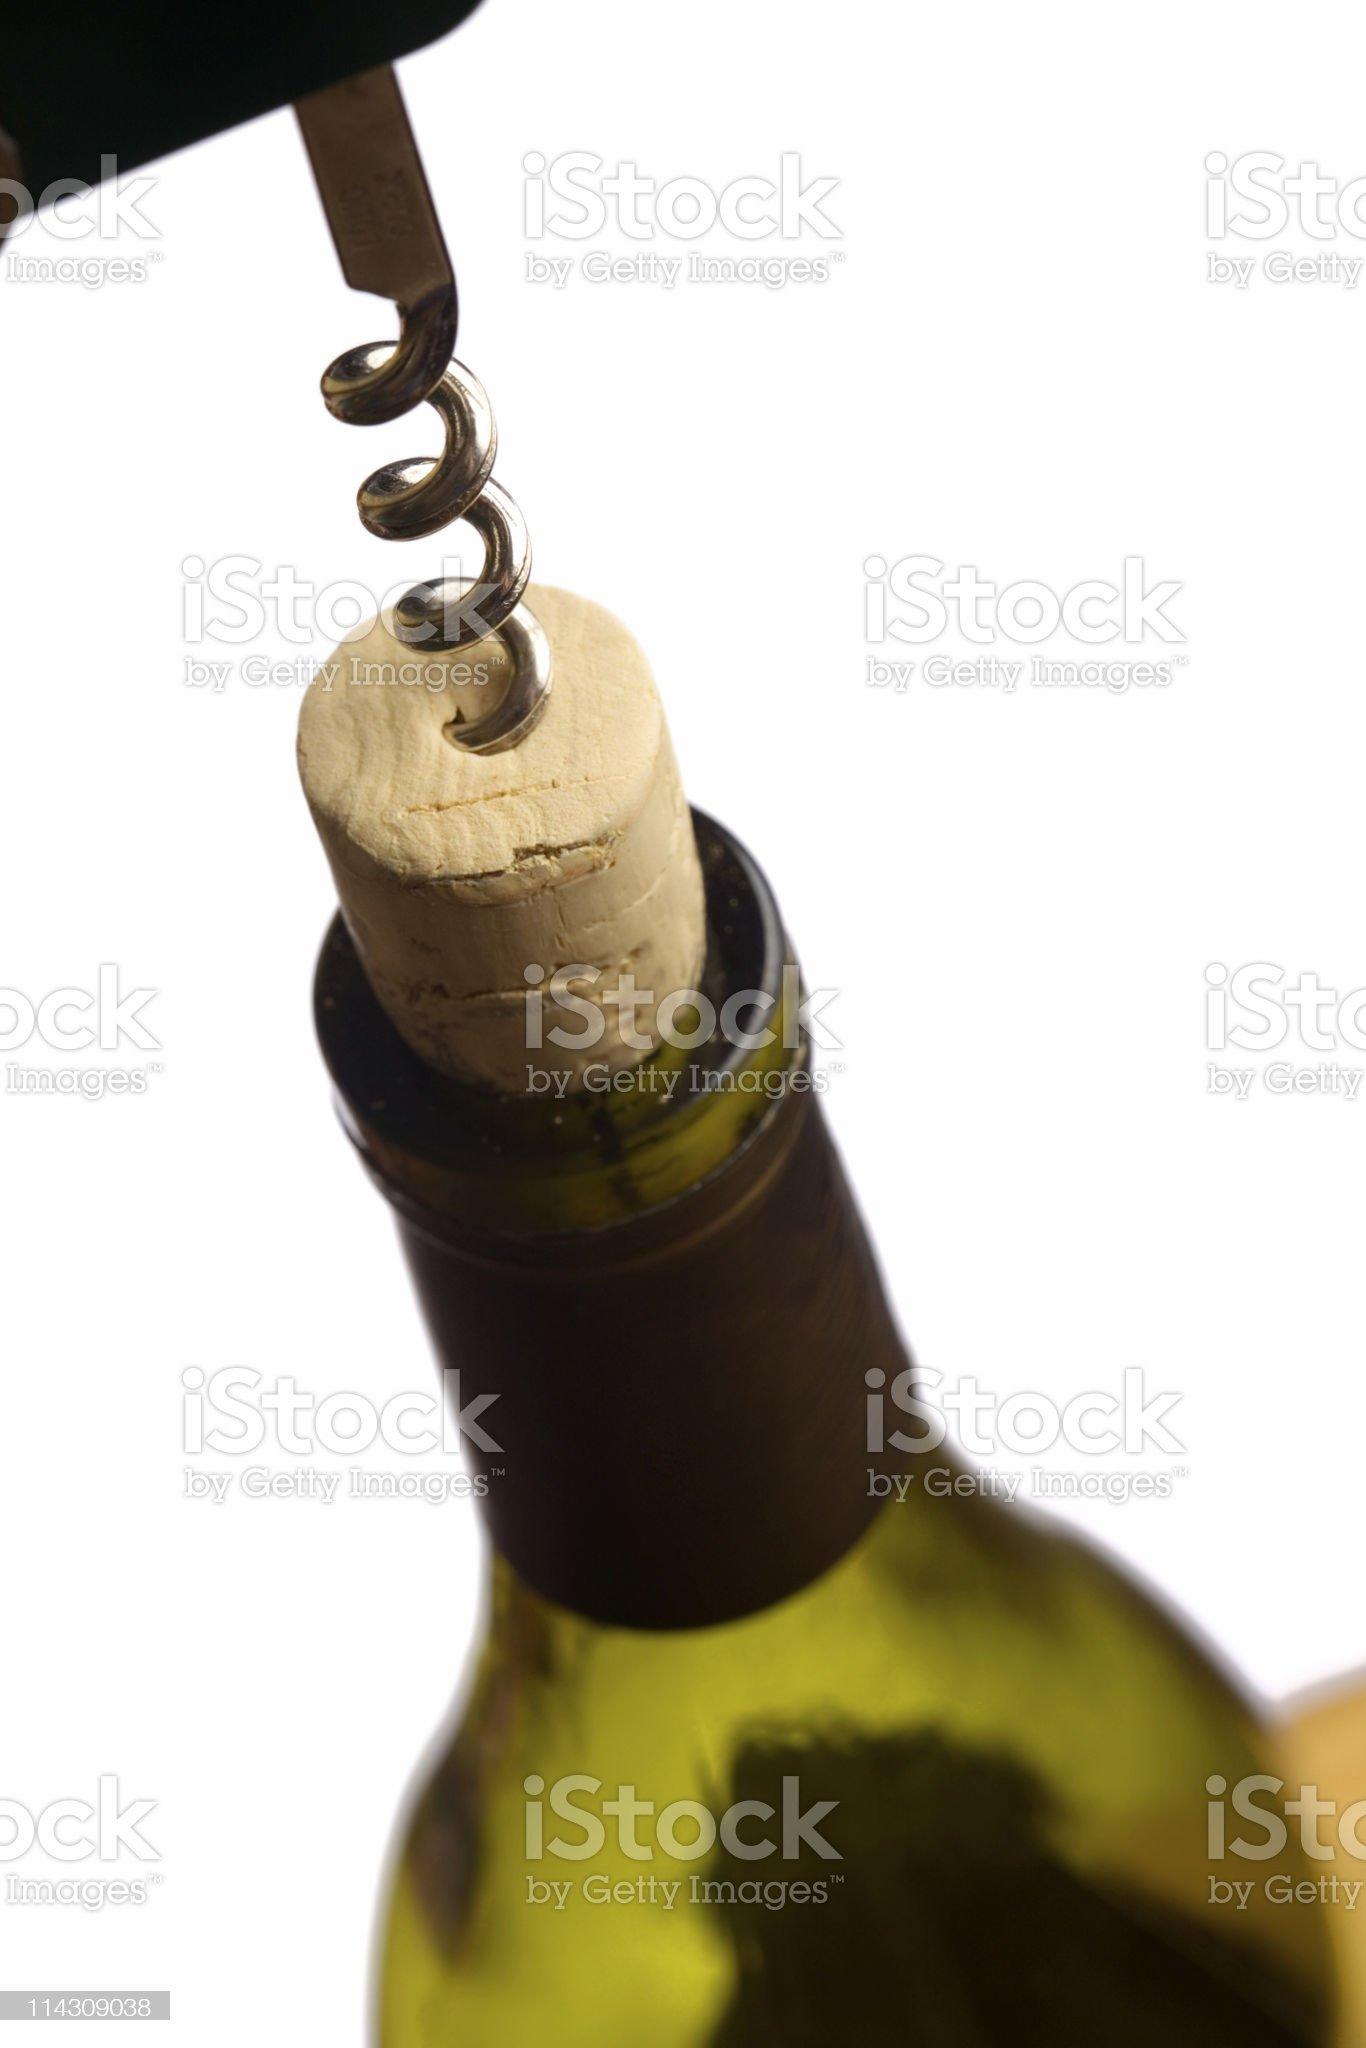 Uncorking wine #1 royalty-free stock photo